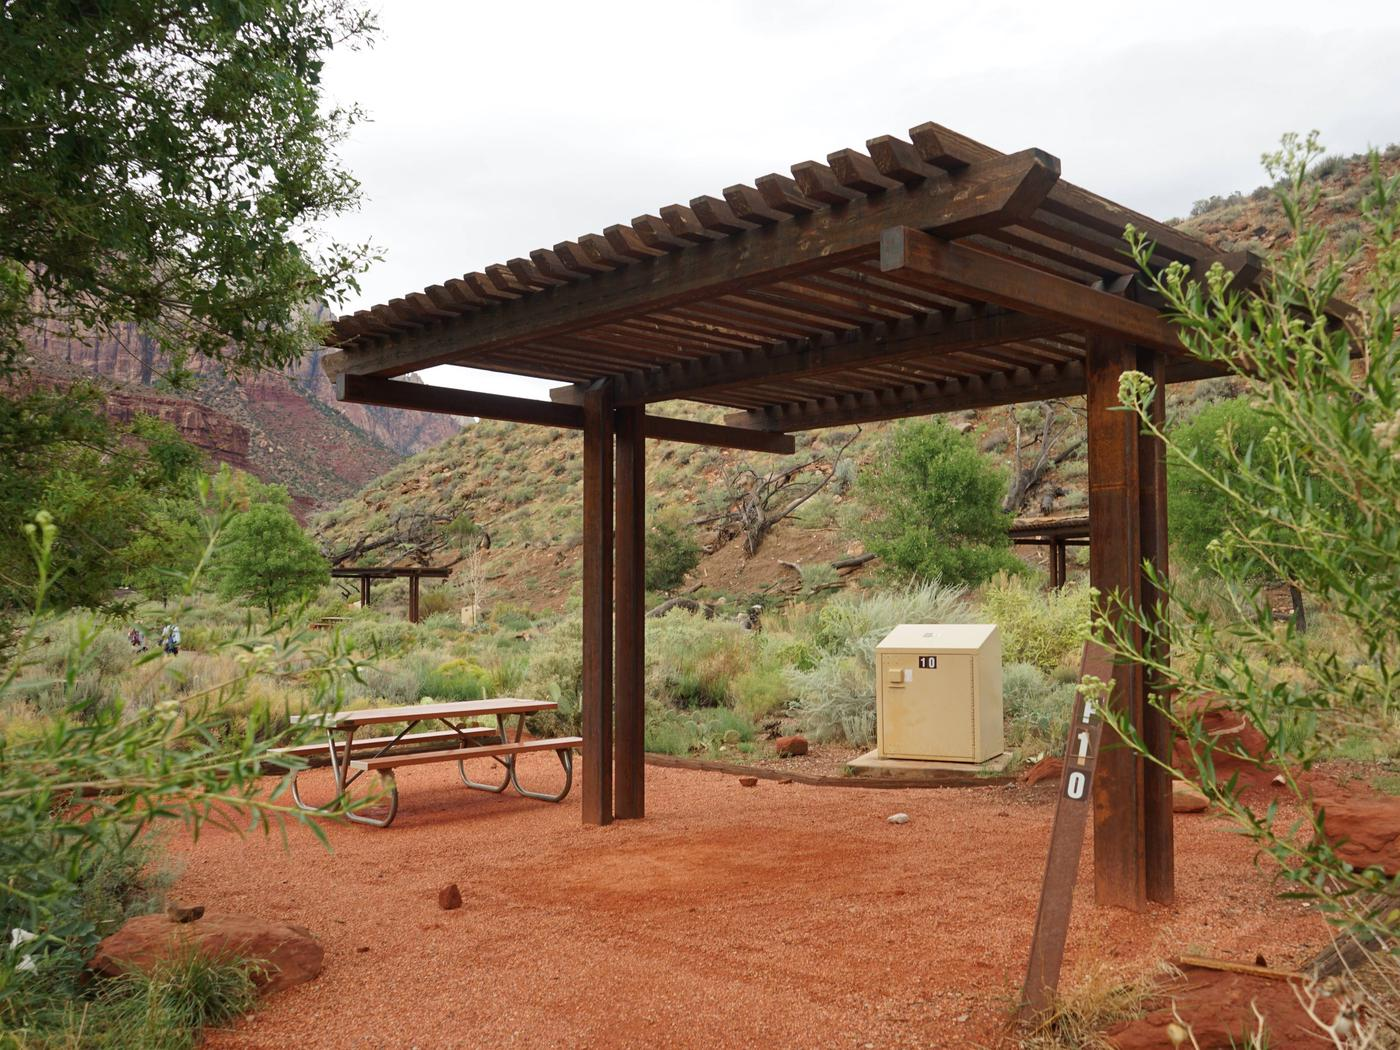 Campsite areaF10